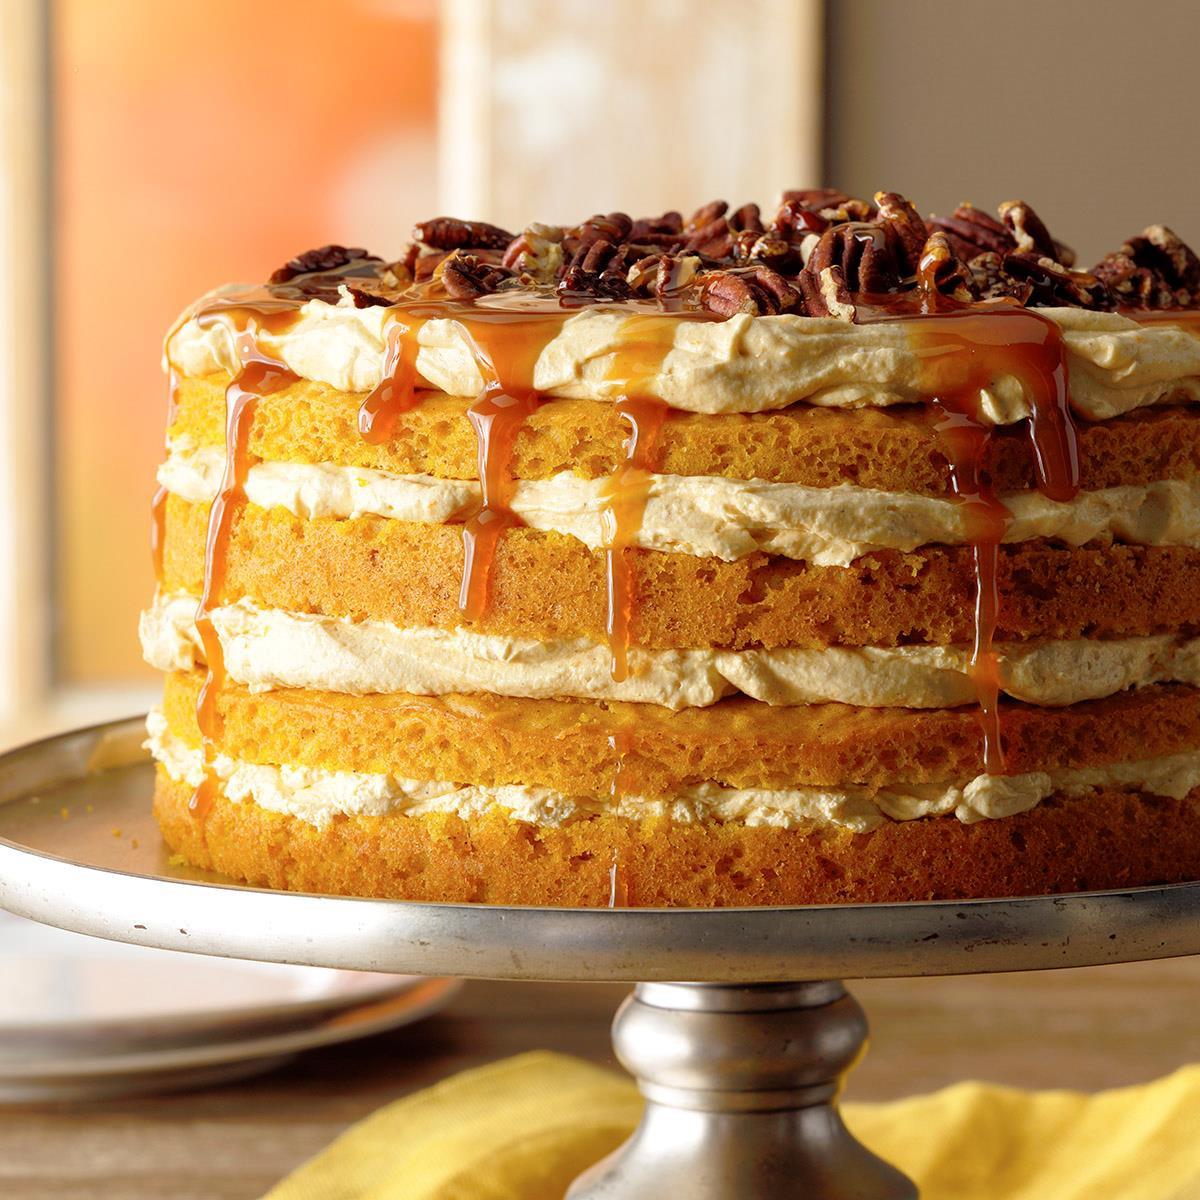 Fall Pumpkin Desserts  Impressive Thanksgiving Desserts You Gotta Try This Year